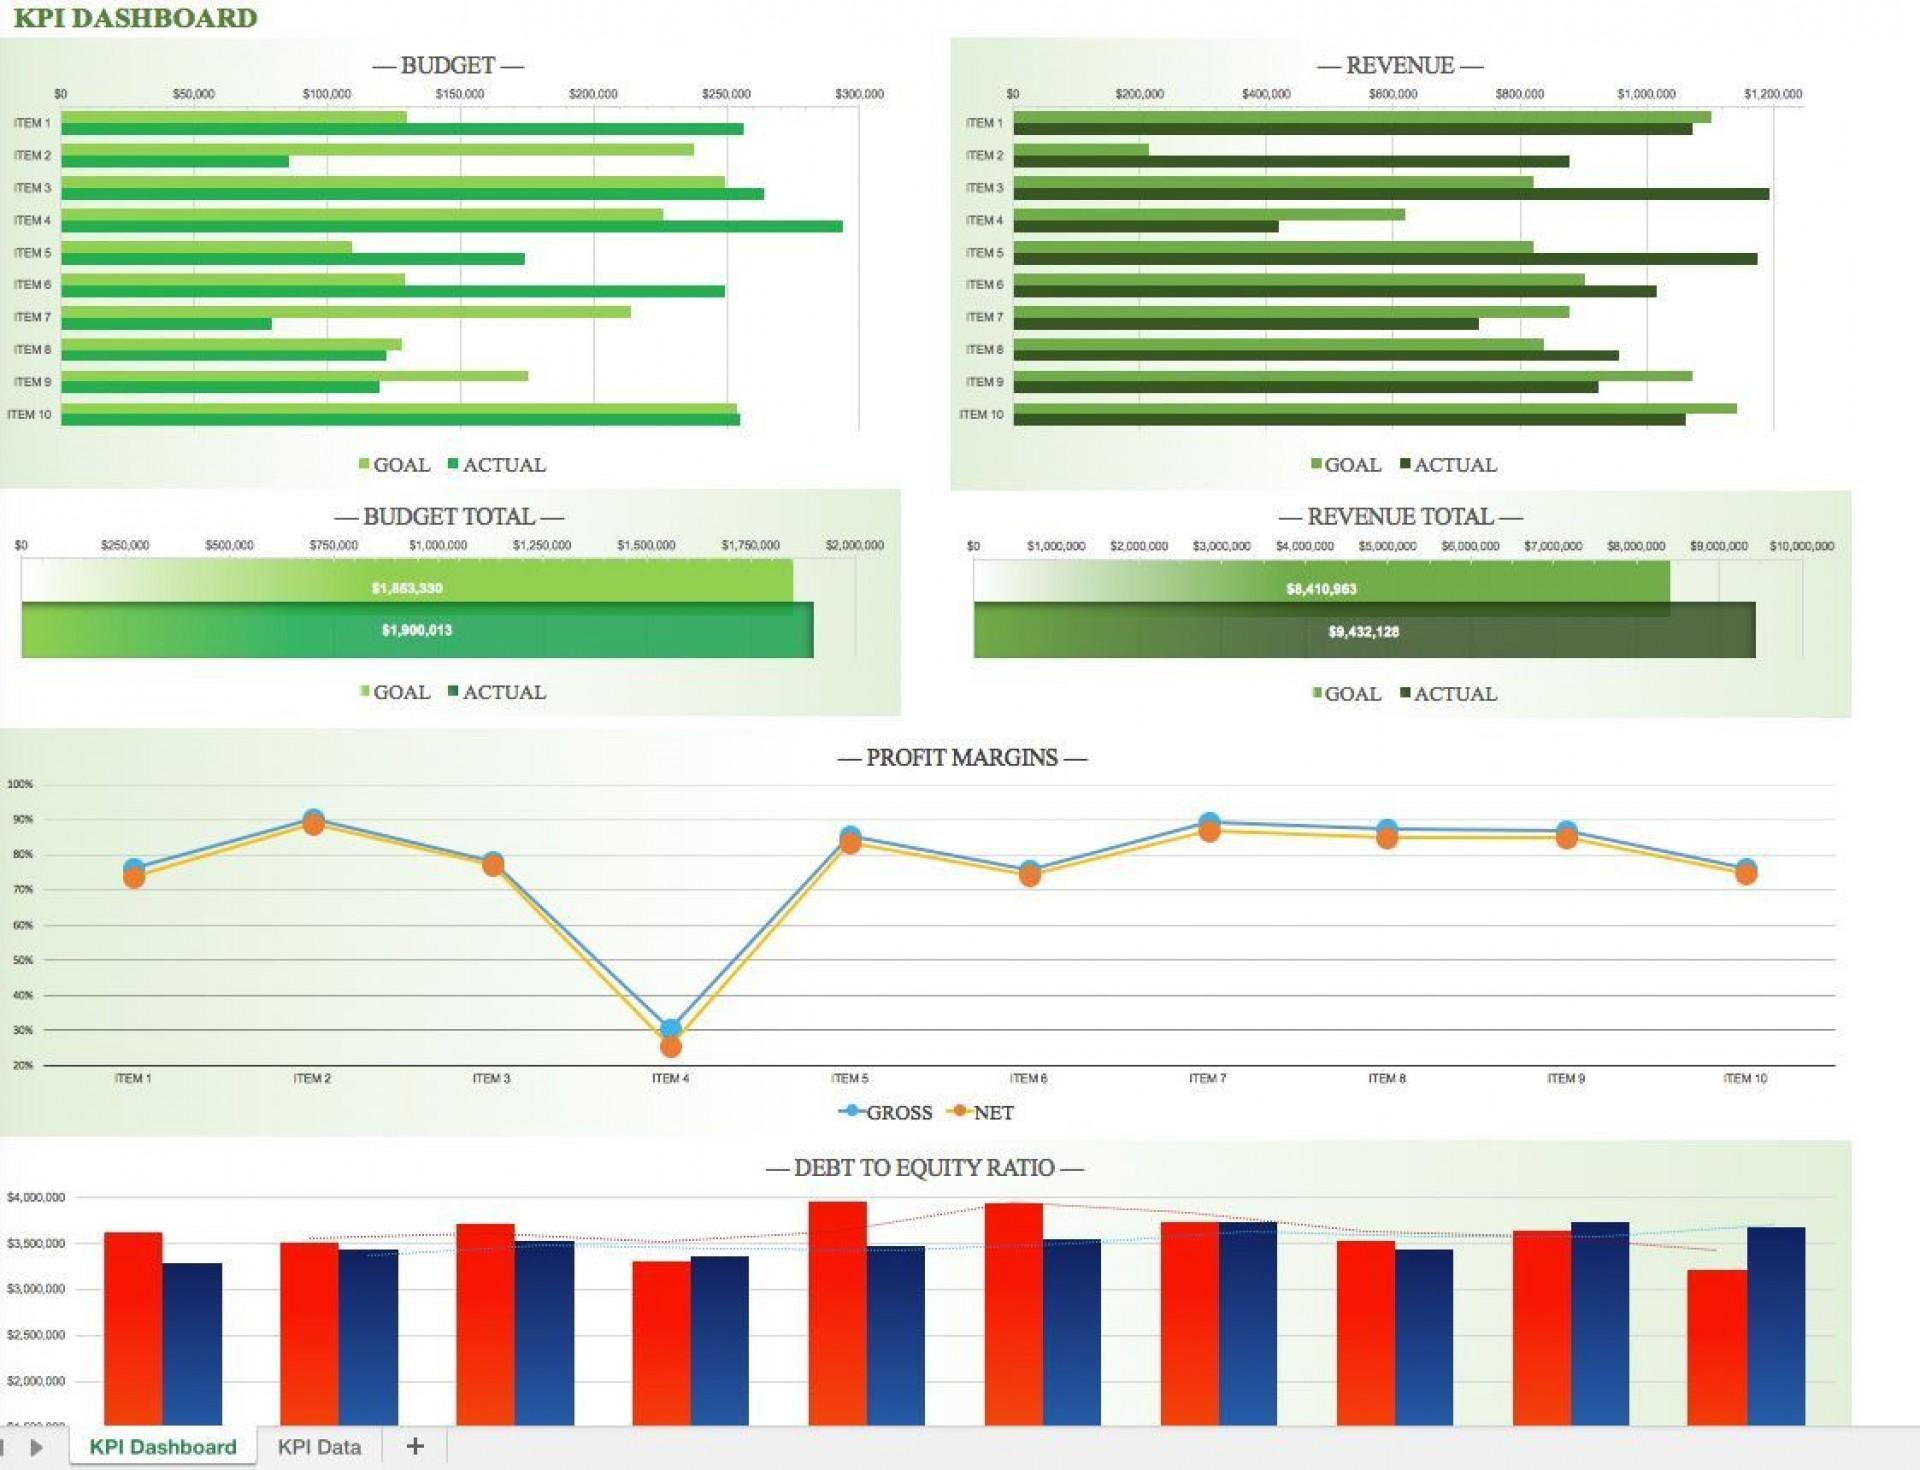 000 Unique Excel Dashboard Template Free Inspiration  Sale Logistic Kpi Download Procurement1920